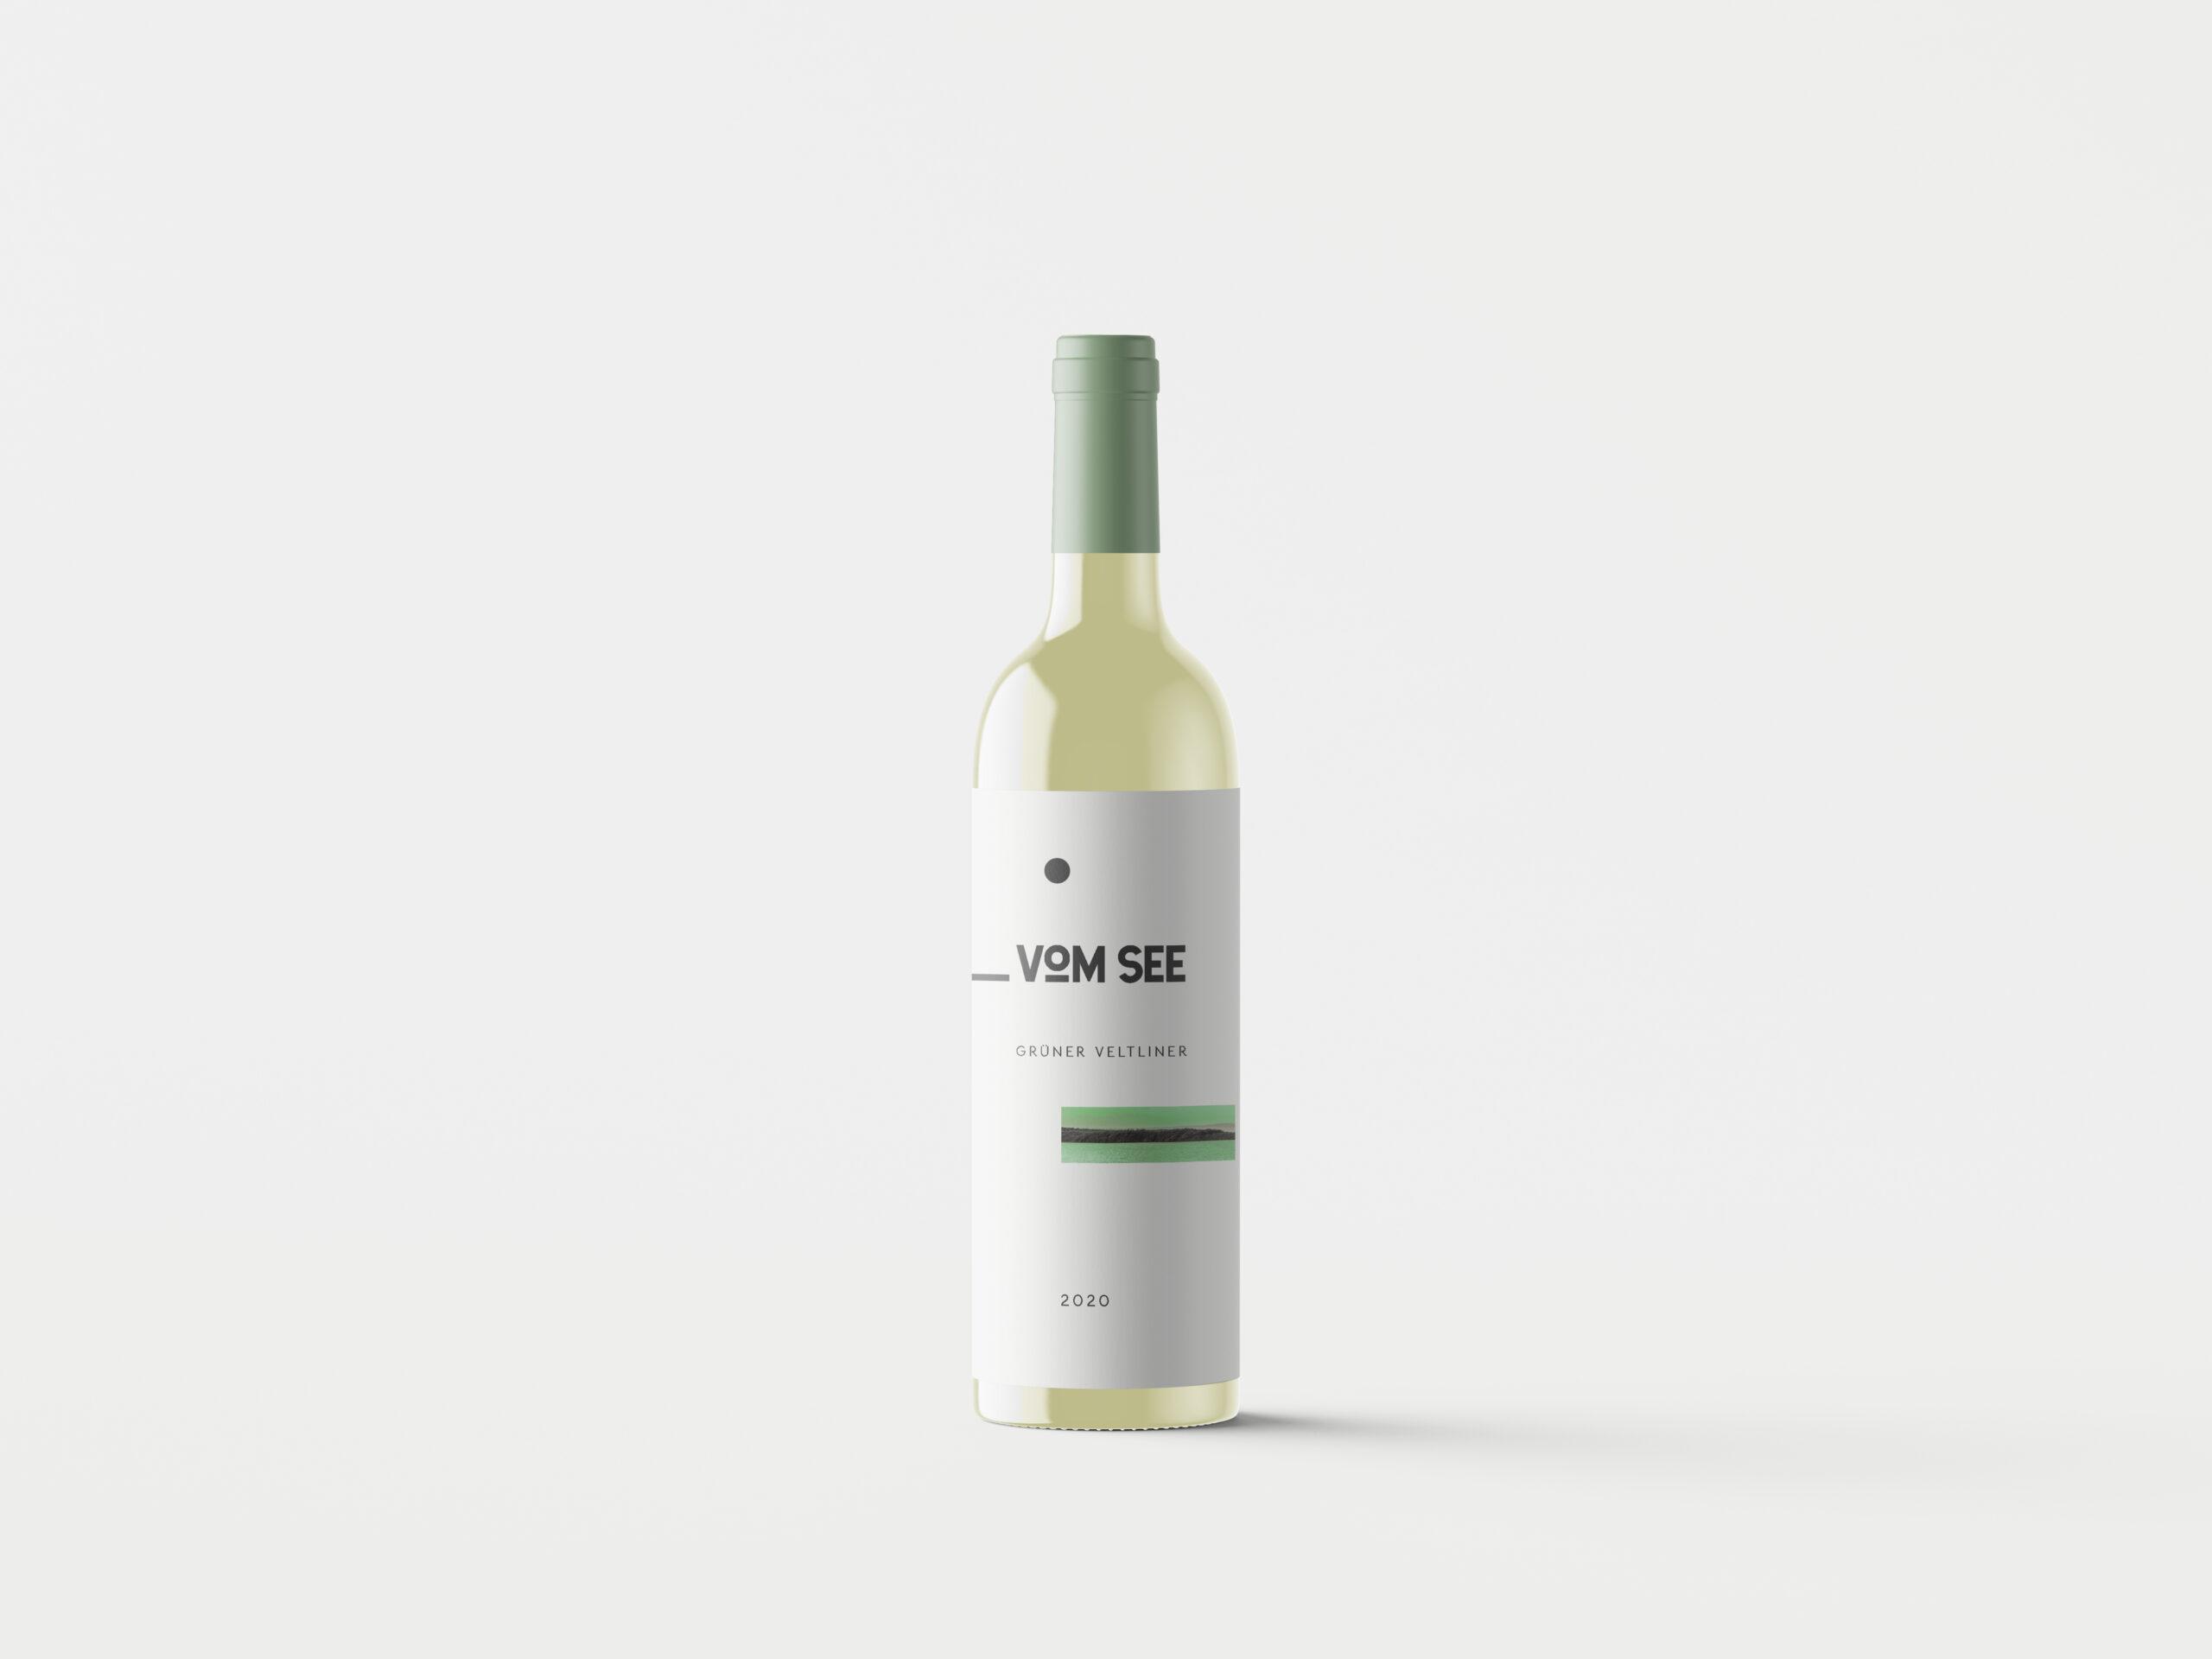 Etiketten Gestaltung Grüner Veltliner